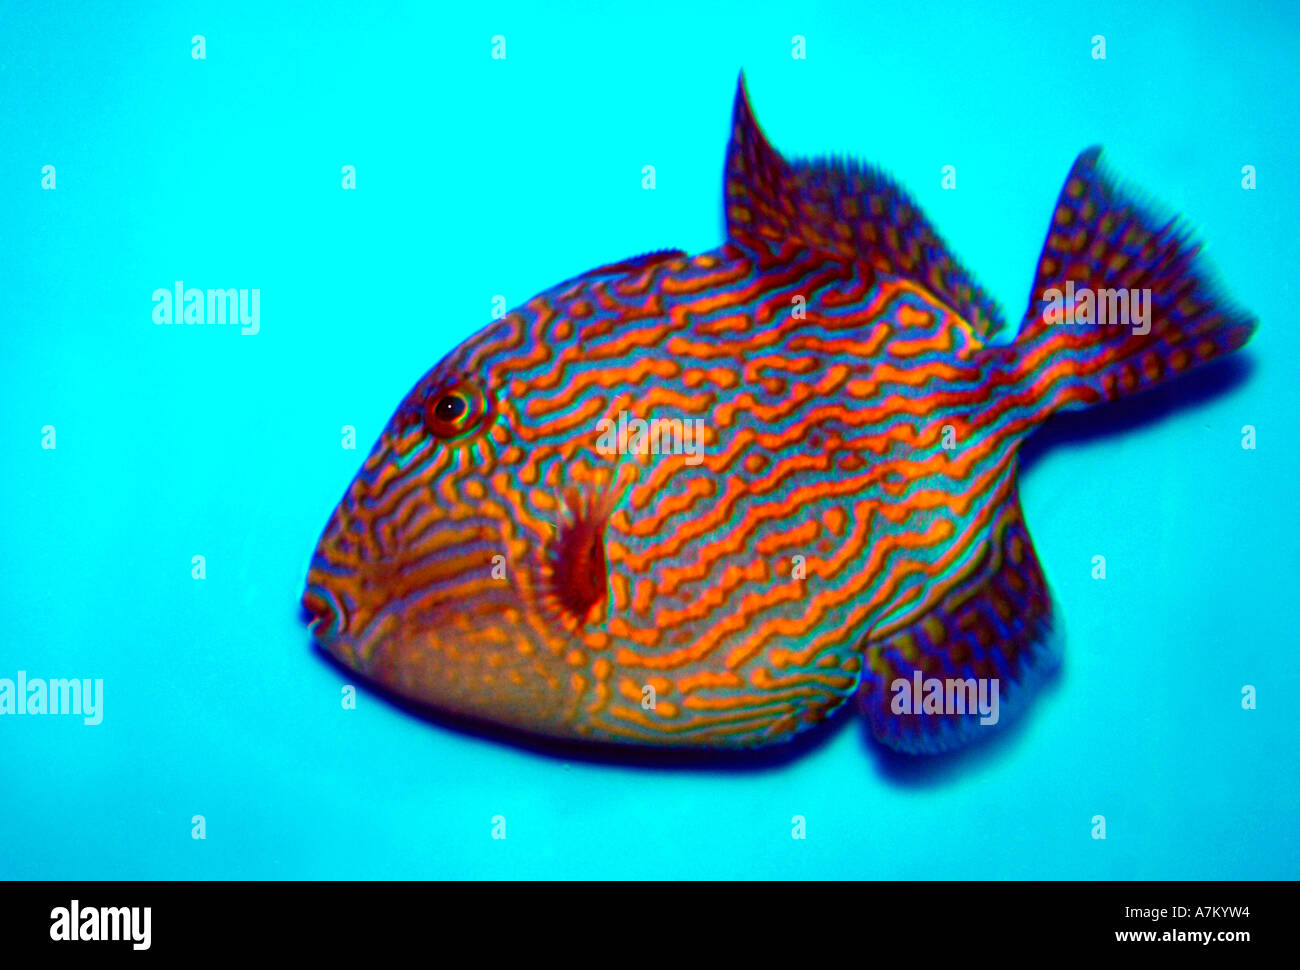 Jigsaw Trigger Fish (Pseudobalistes fuscus) - Stock Image